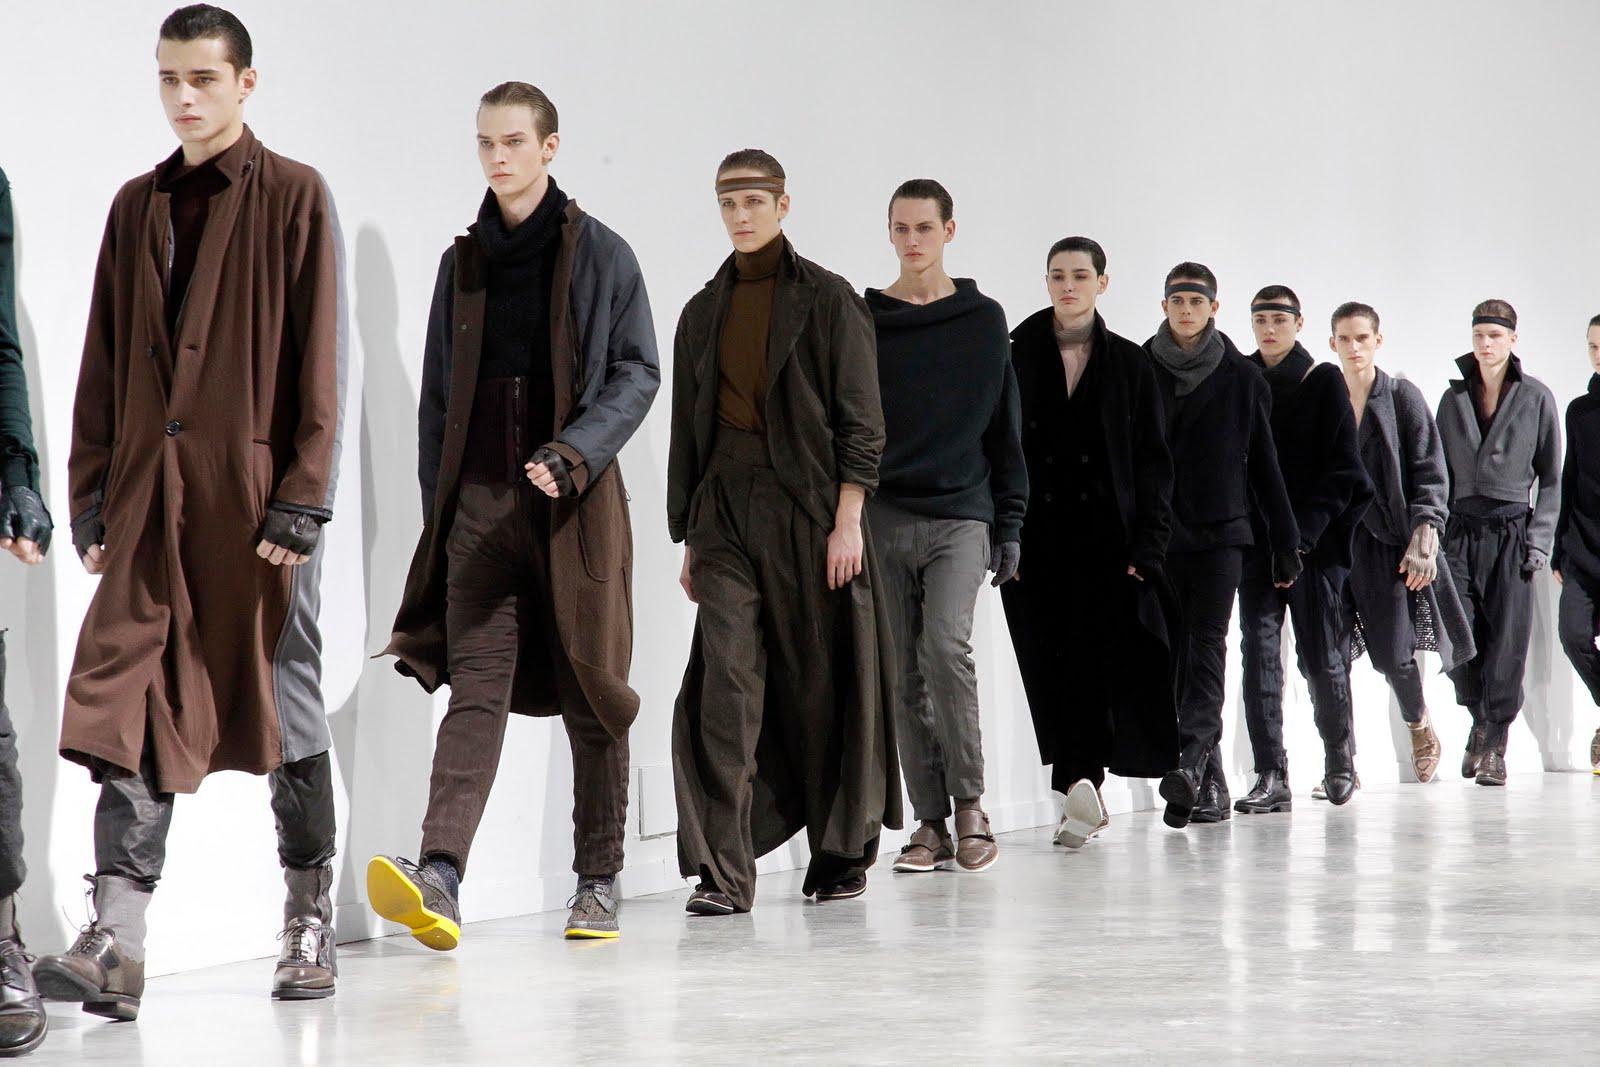 Haute men contemporary couture for the contemporary couture for Haute couture men